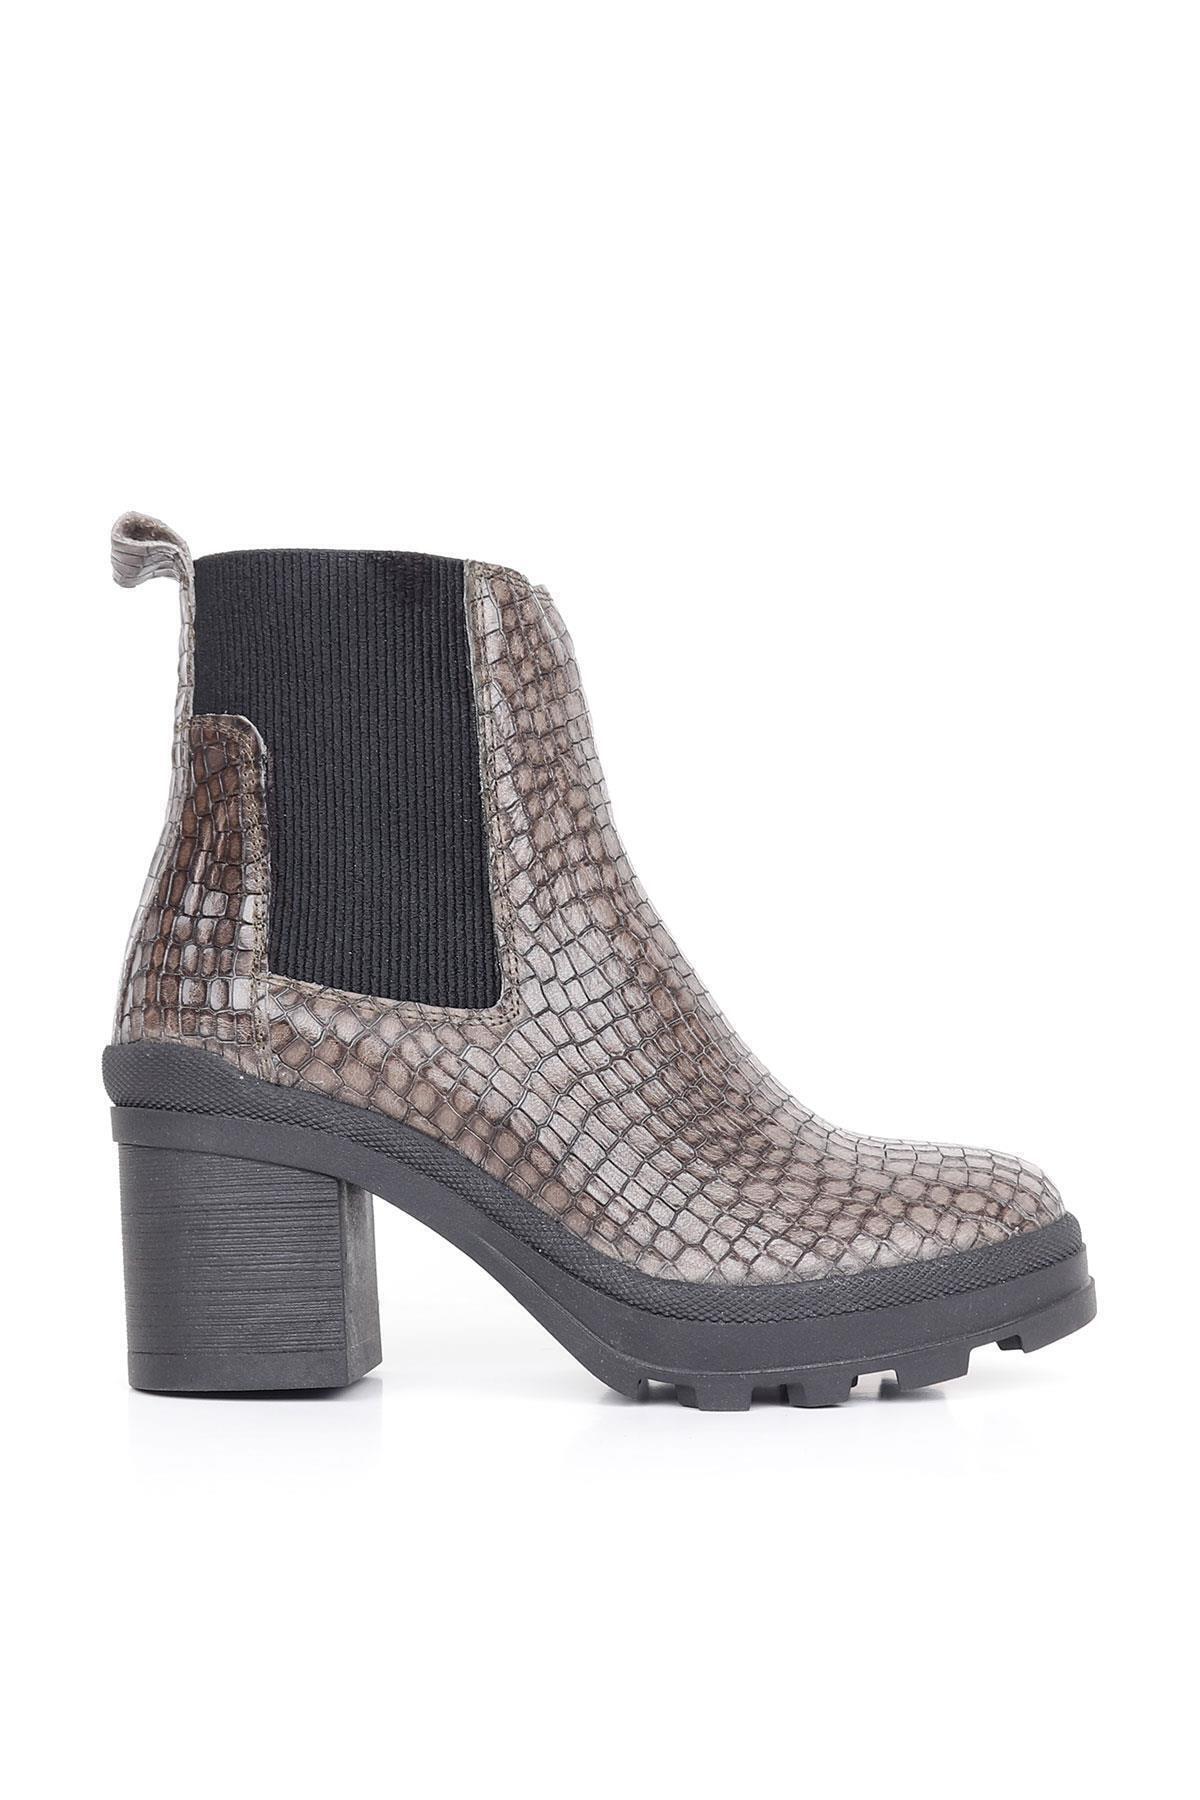 BUENO Kadın Gri Shoes Deri Topuklu Bot 01wr0503